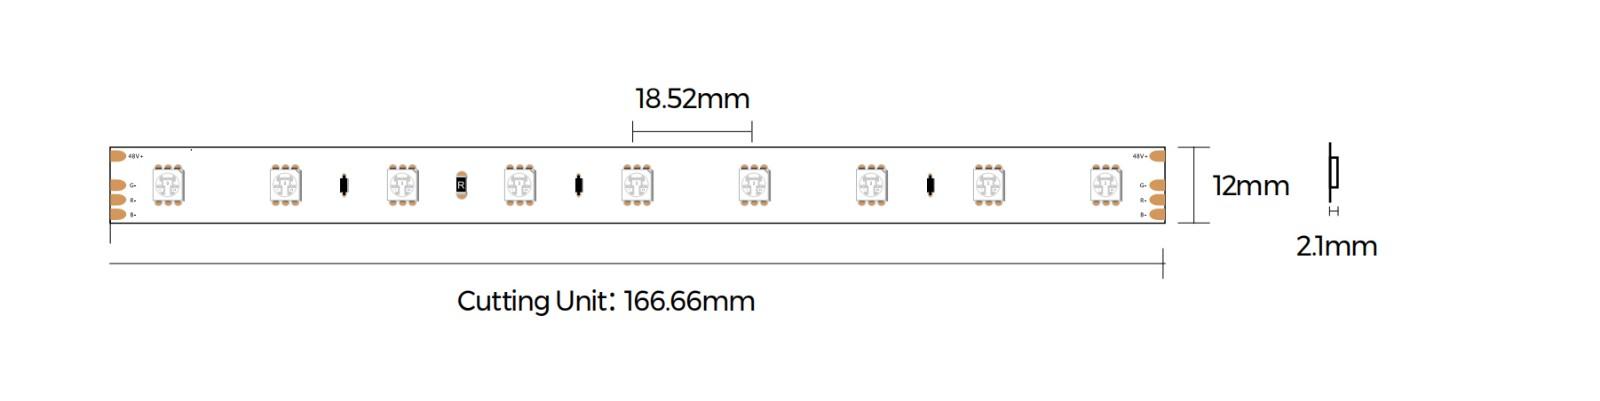 DS554RGB-48V-12mm